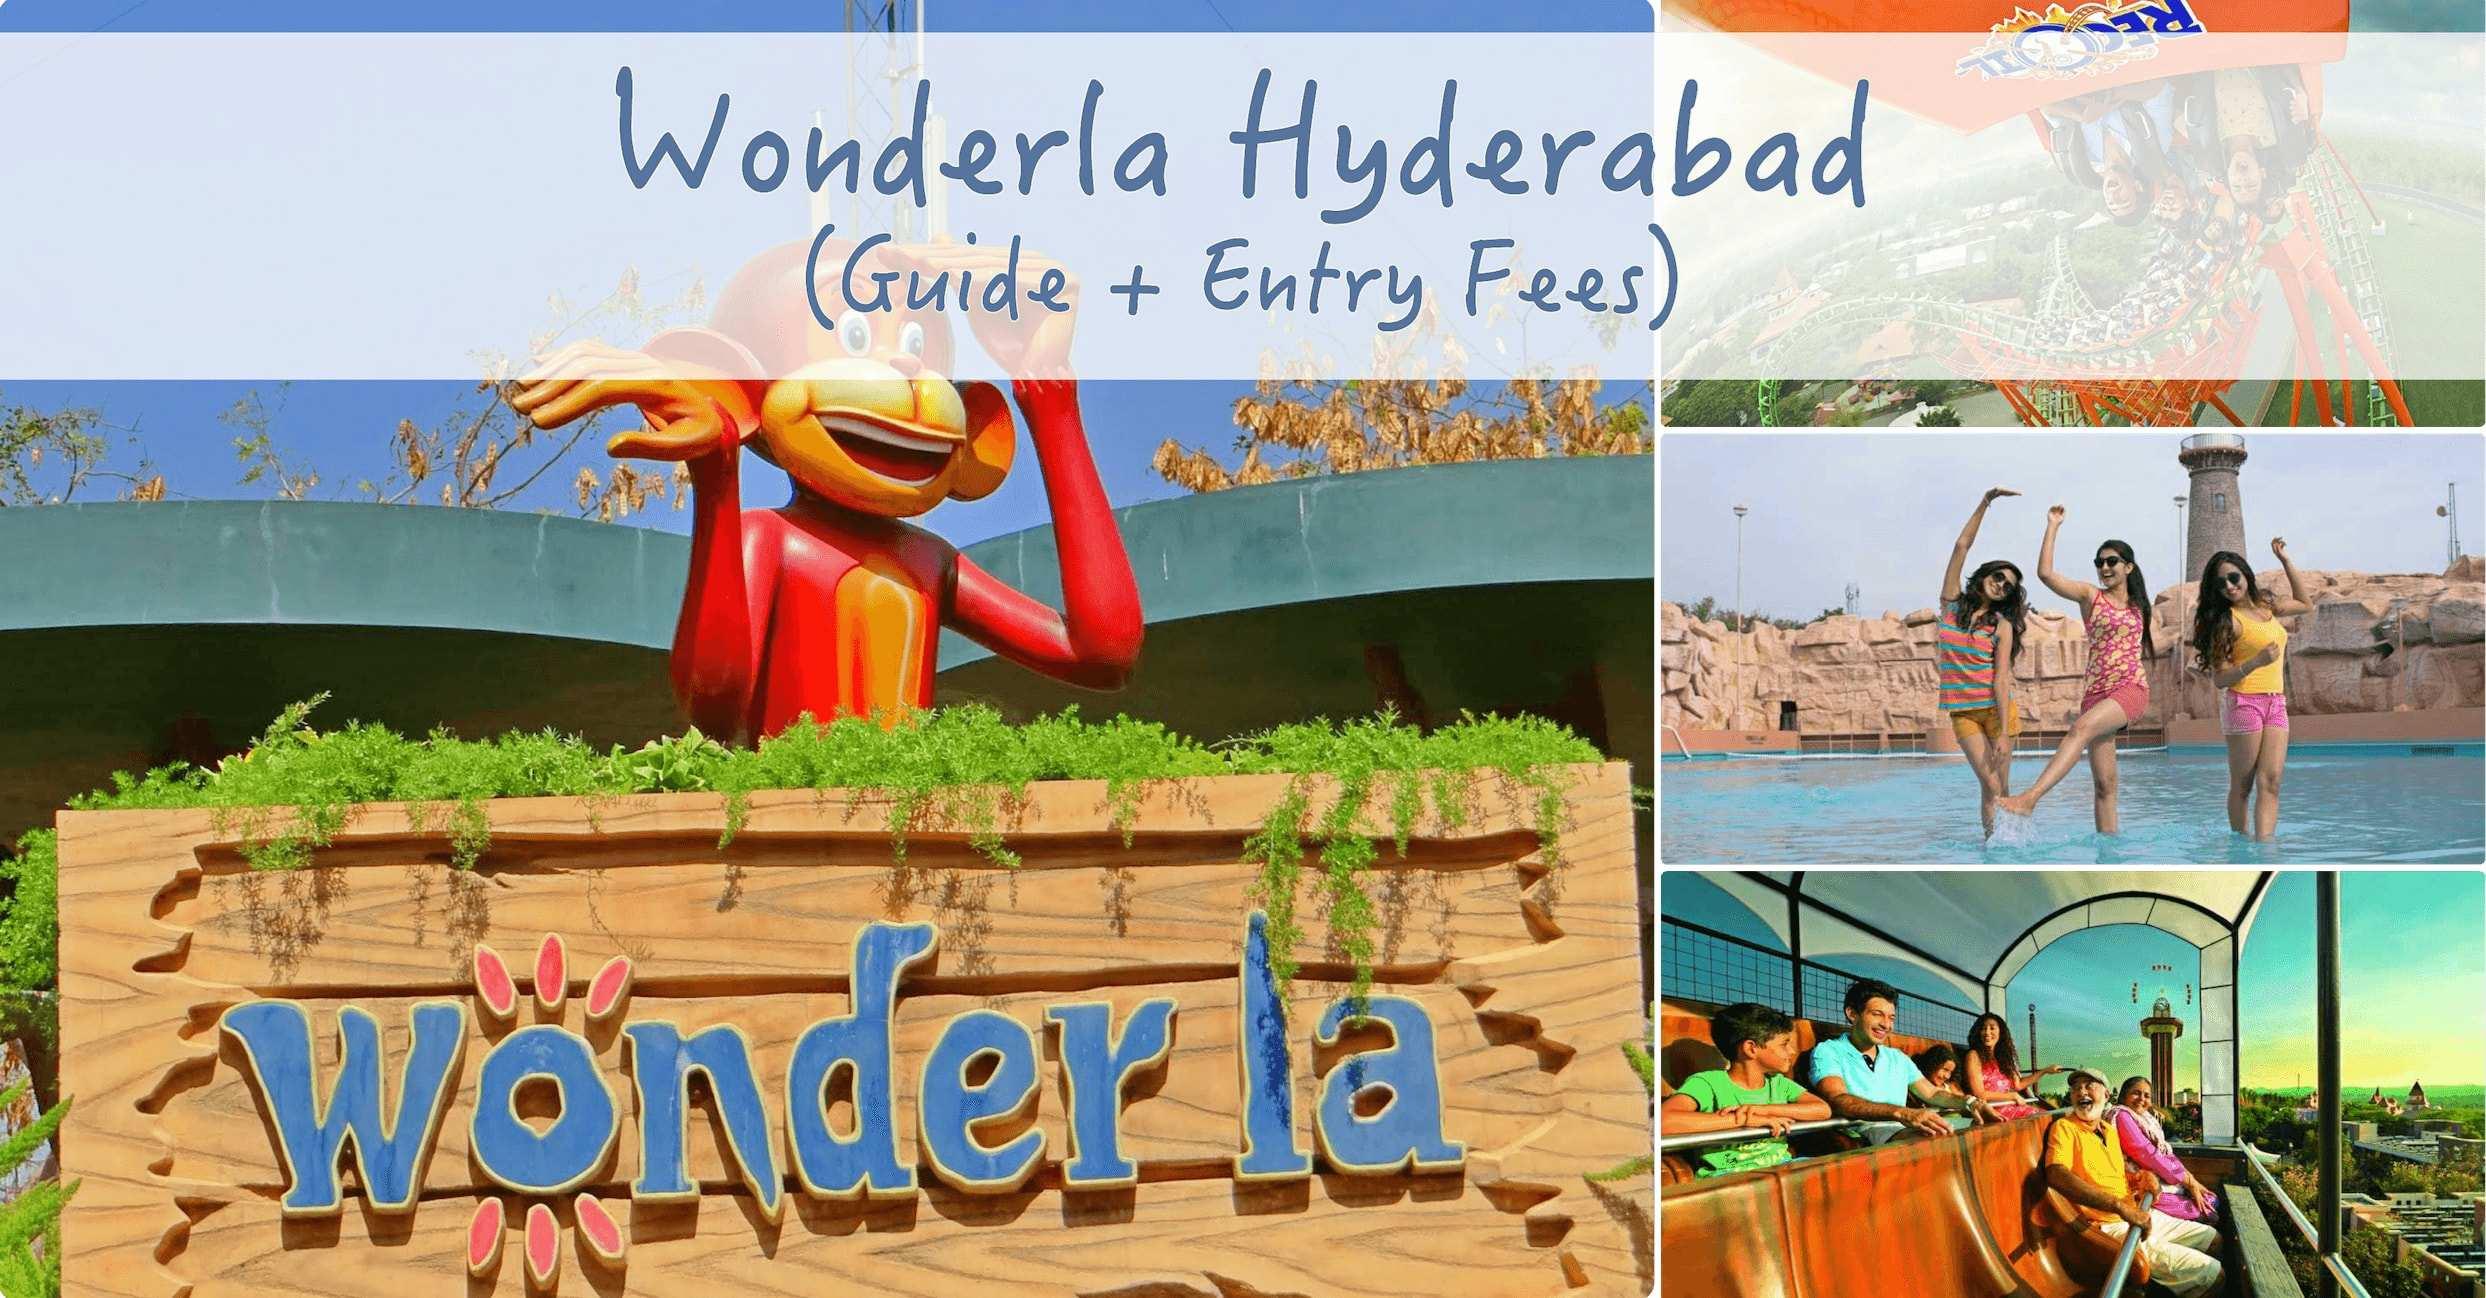 Wonderla-Amusement-Park-entry-fee-Hyderabad.